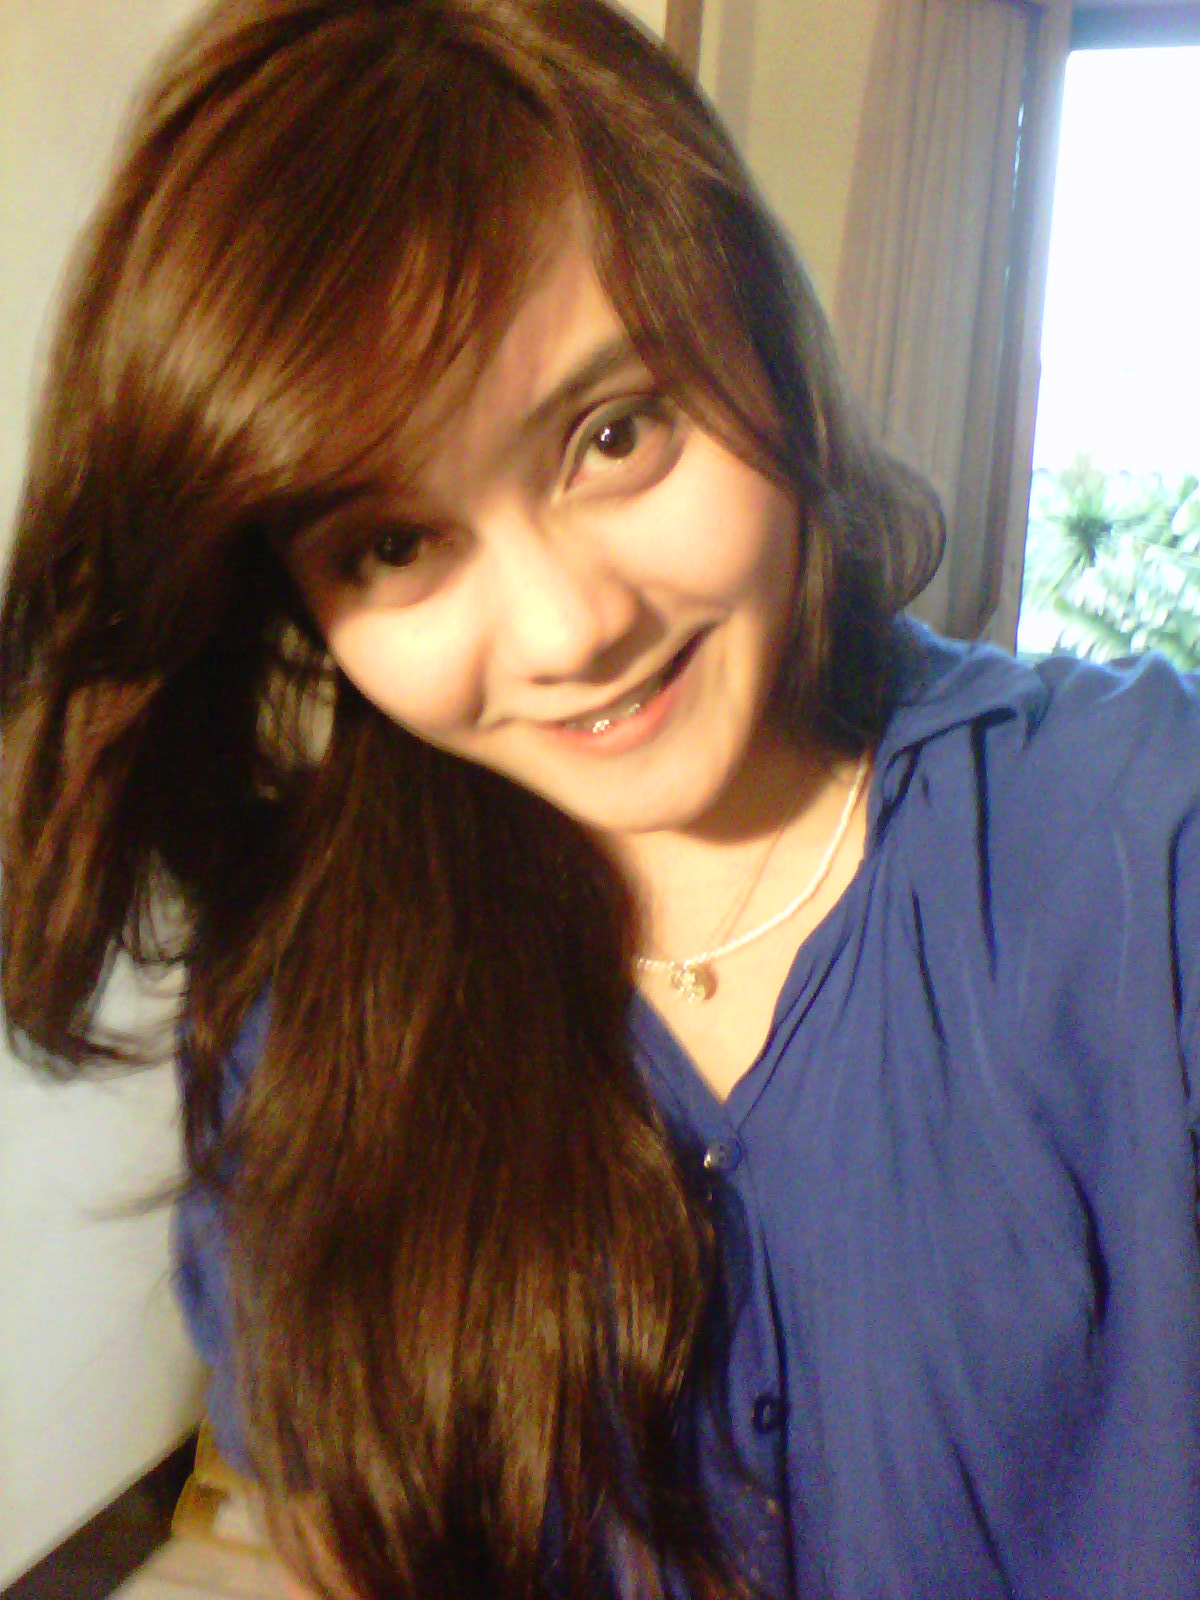 Can I Dye My Hair Light Brown Dark Brown